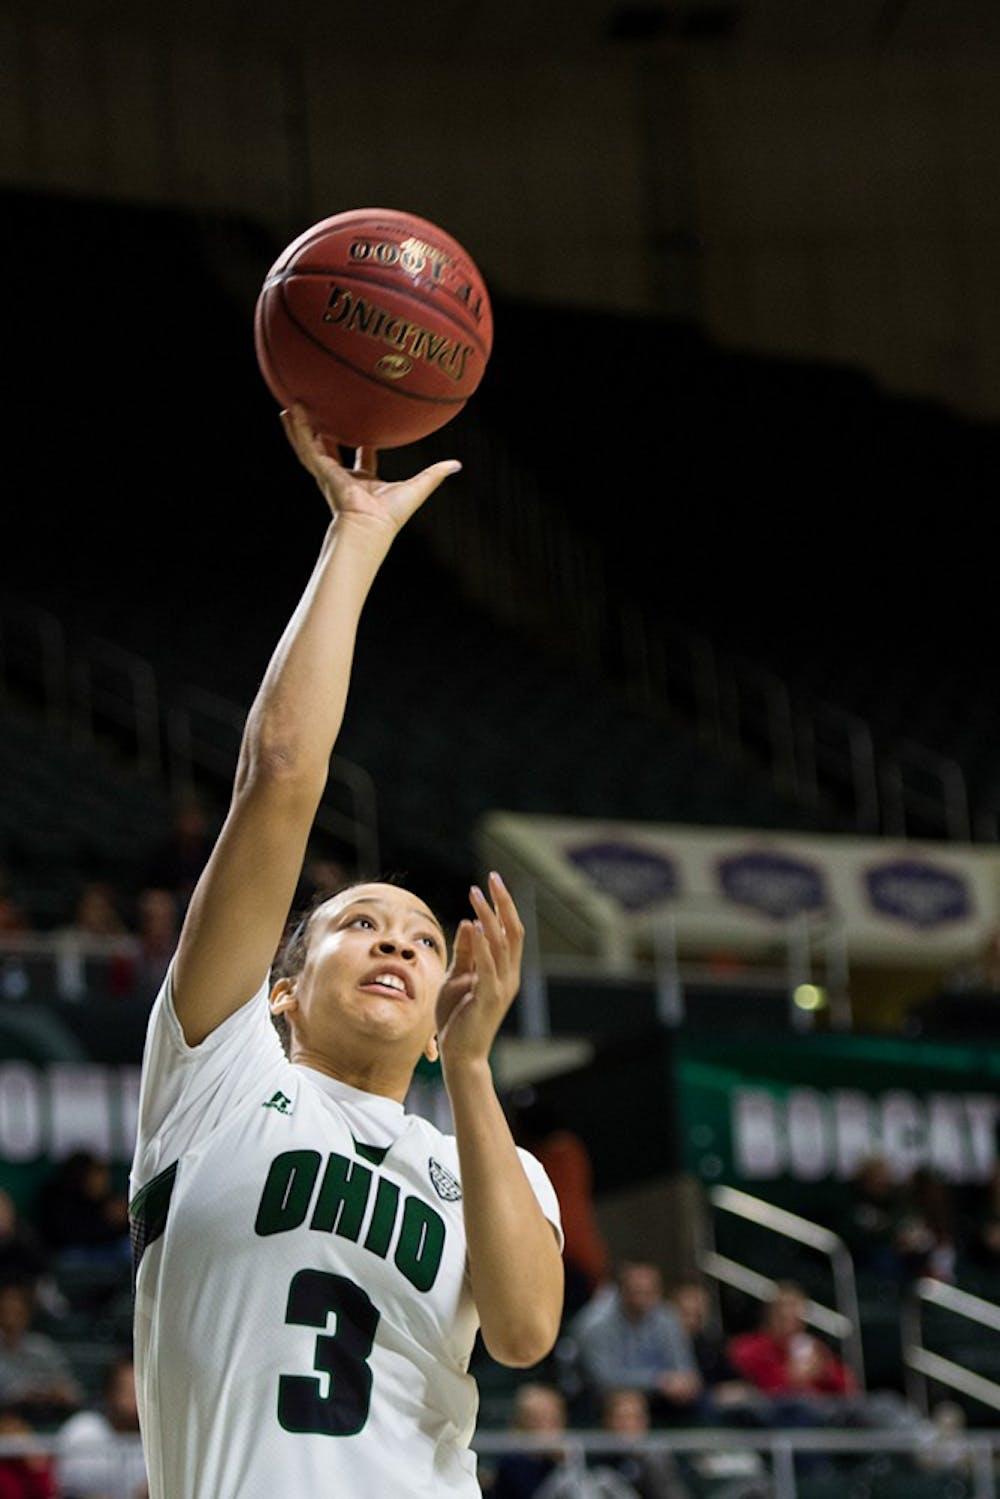 Women's Basketball: Amani Burke scores career-high 21 points, Bobcats snap three-game losing streak